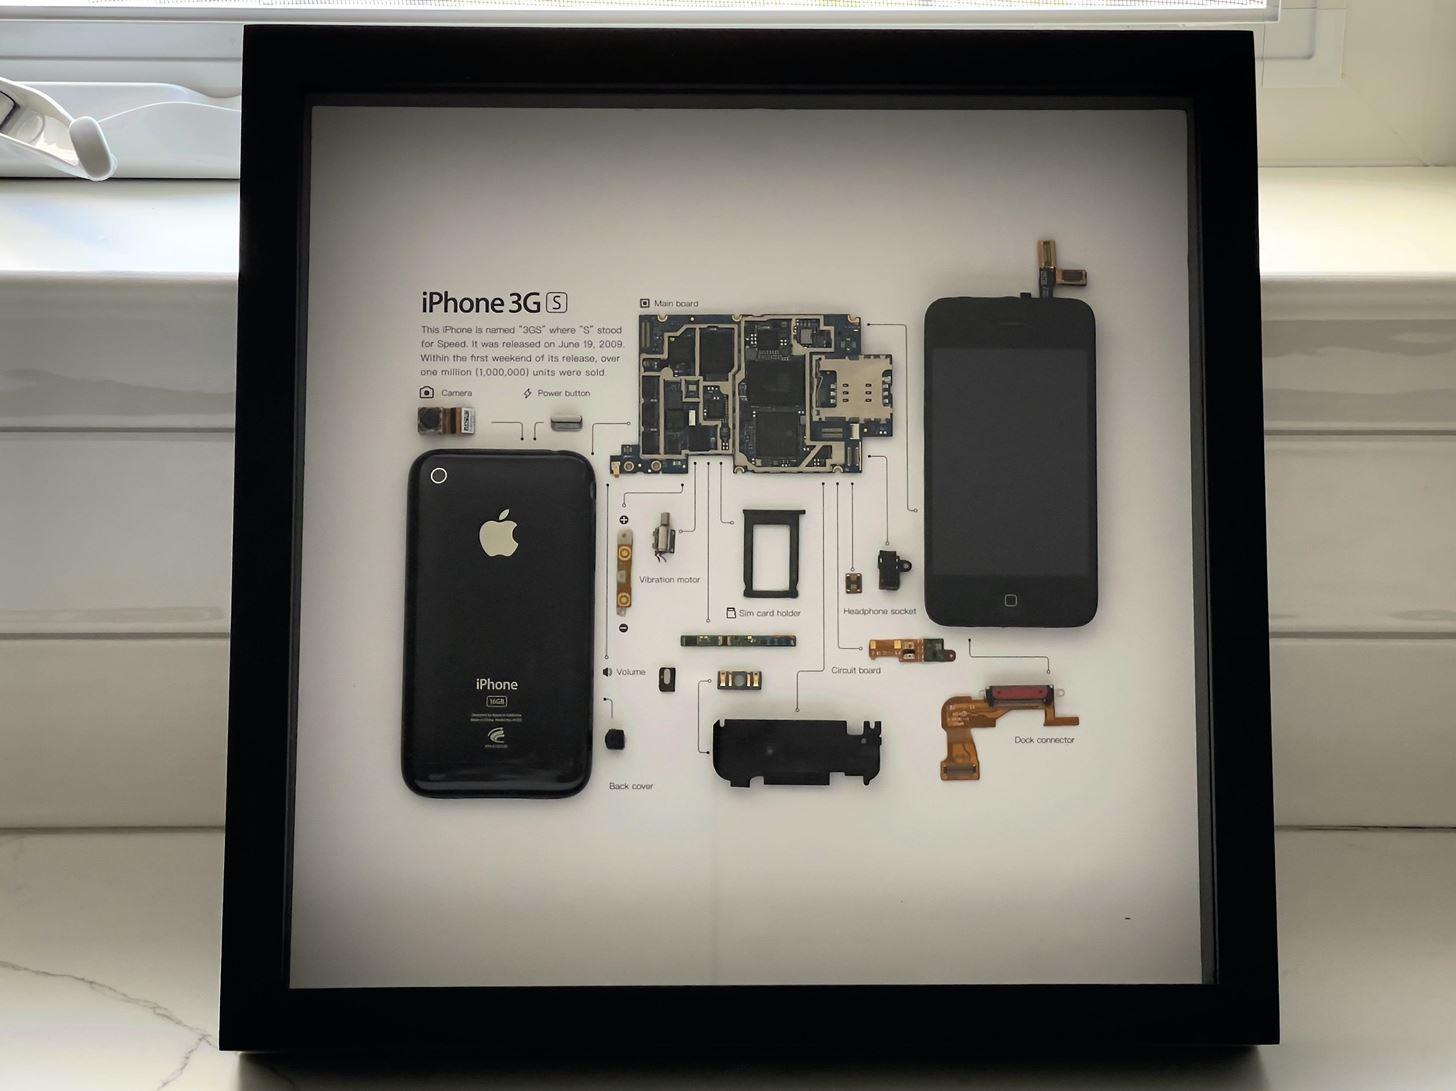 Grid Studio Turns Old iPhones into Works of Art